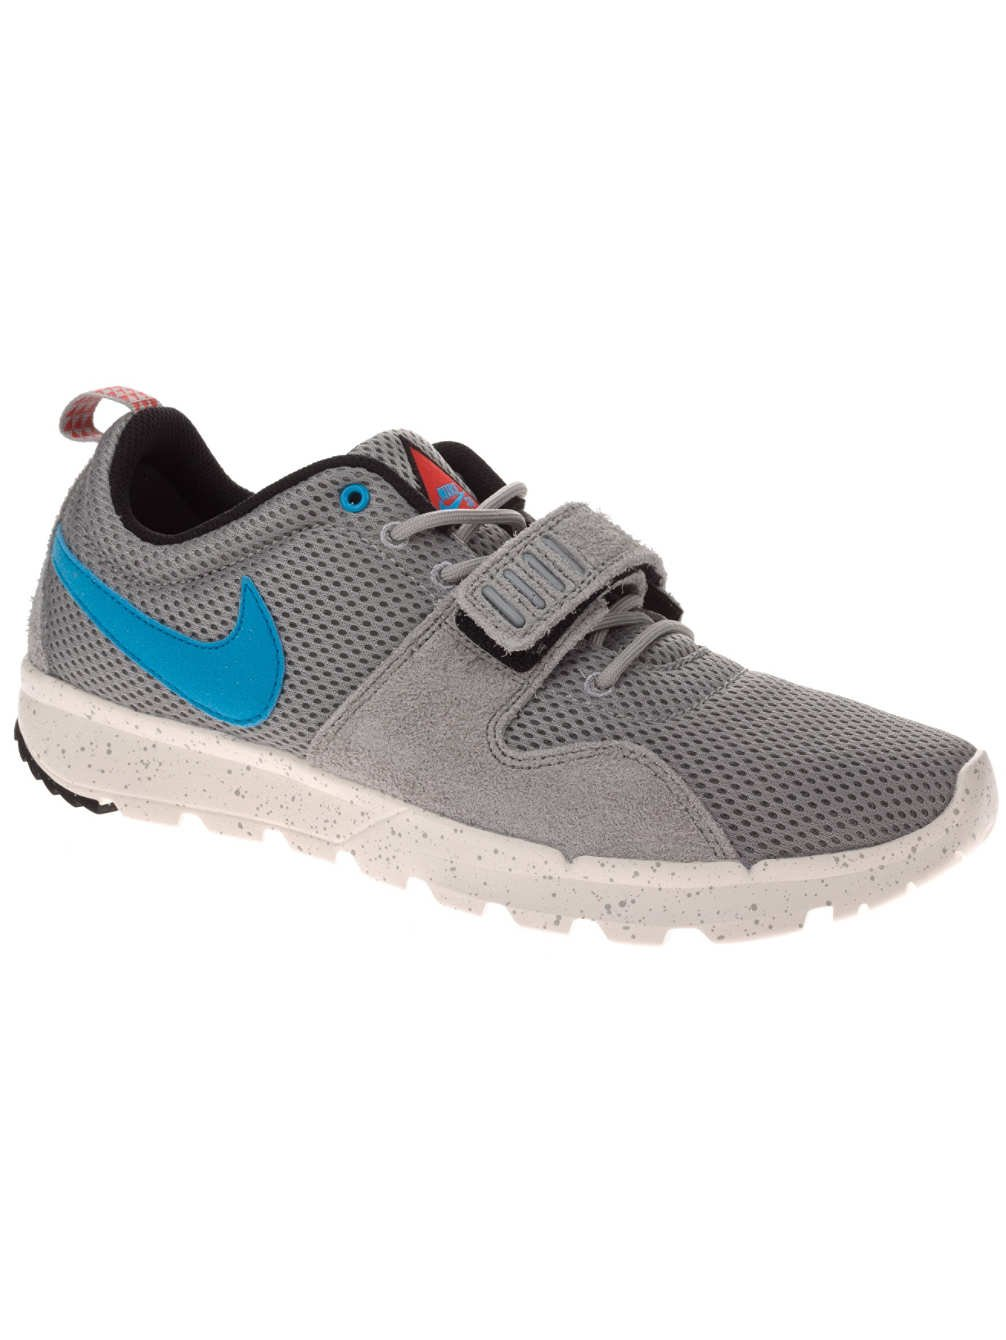 Nike SB Trainerendor Mens Fashion Shoes Base Grey / Sail Black Vivid Blue